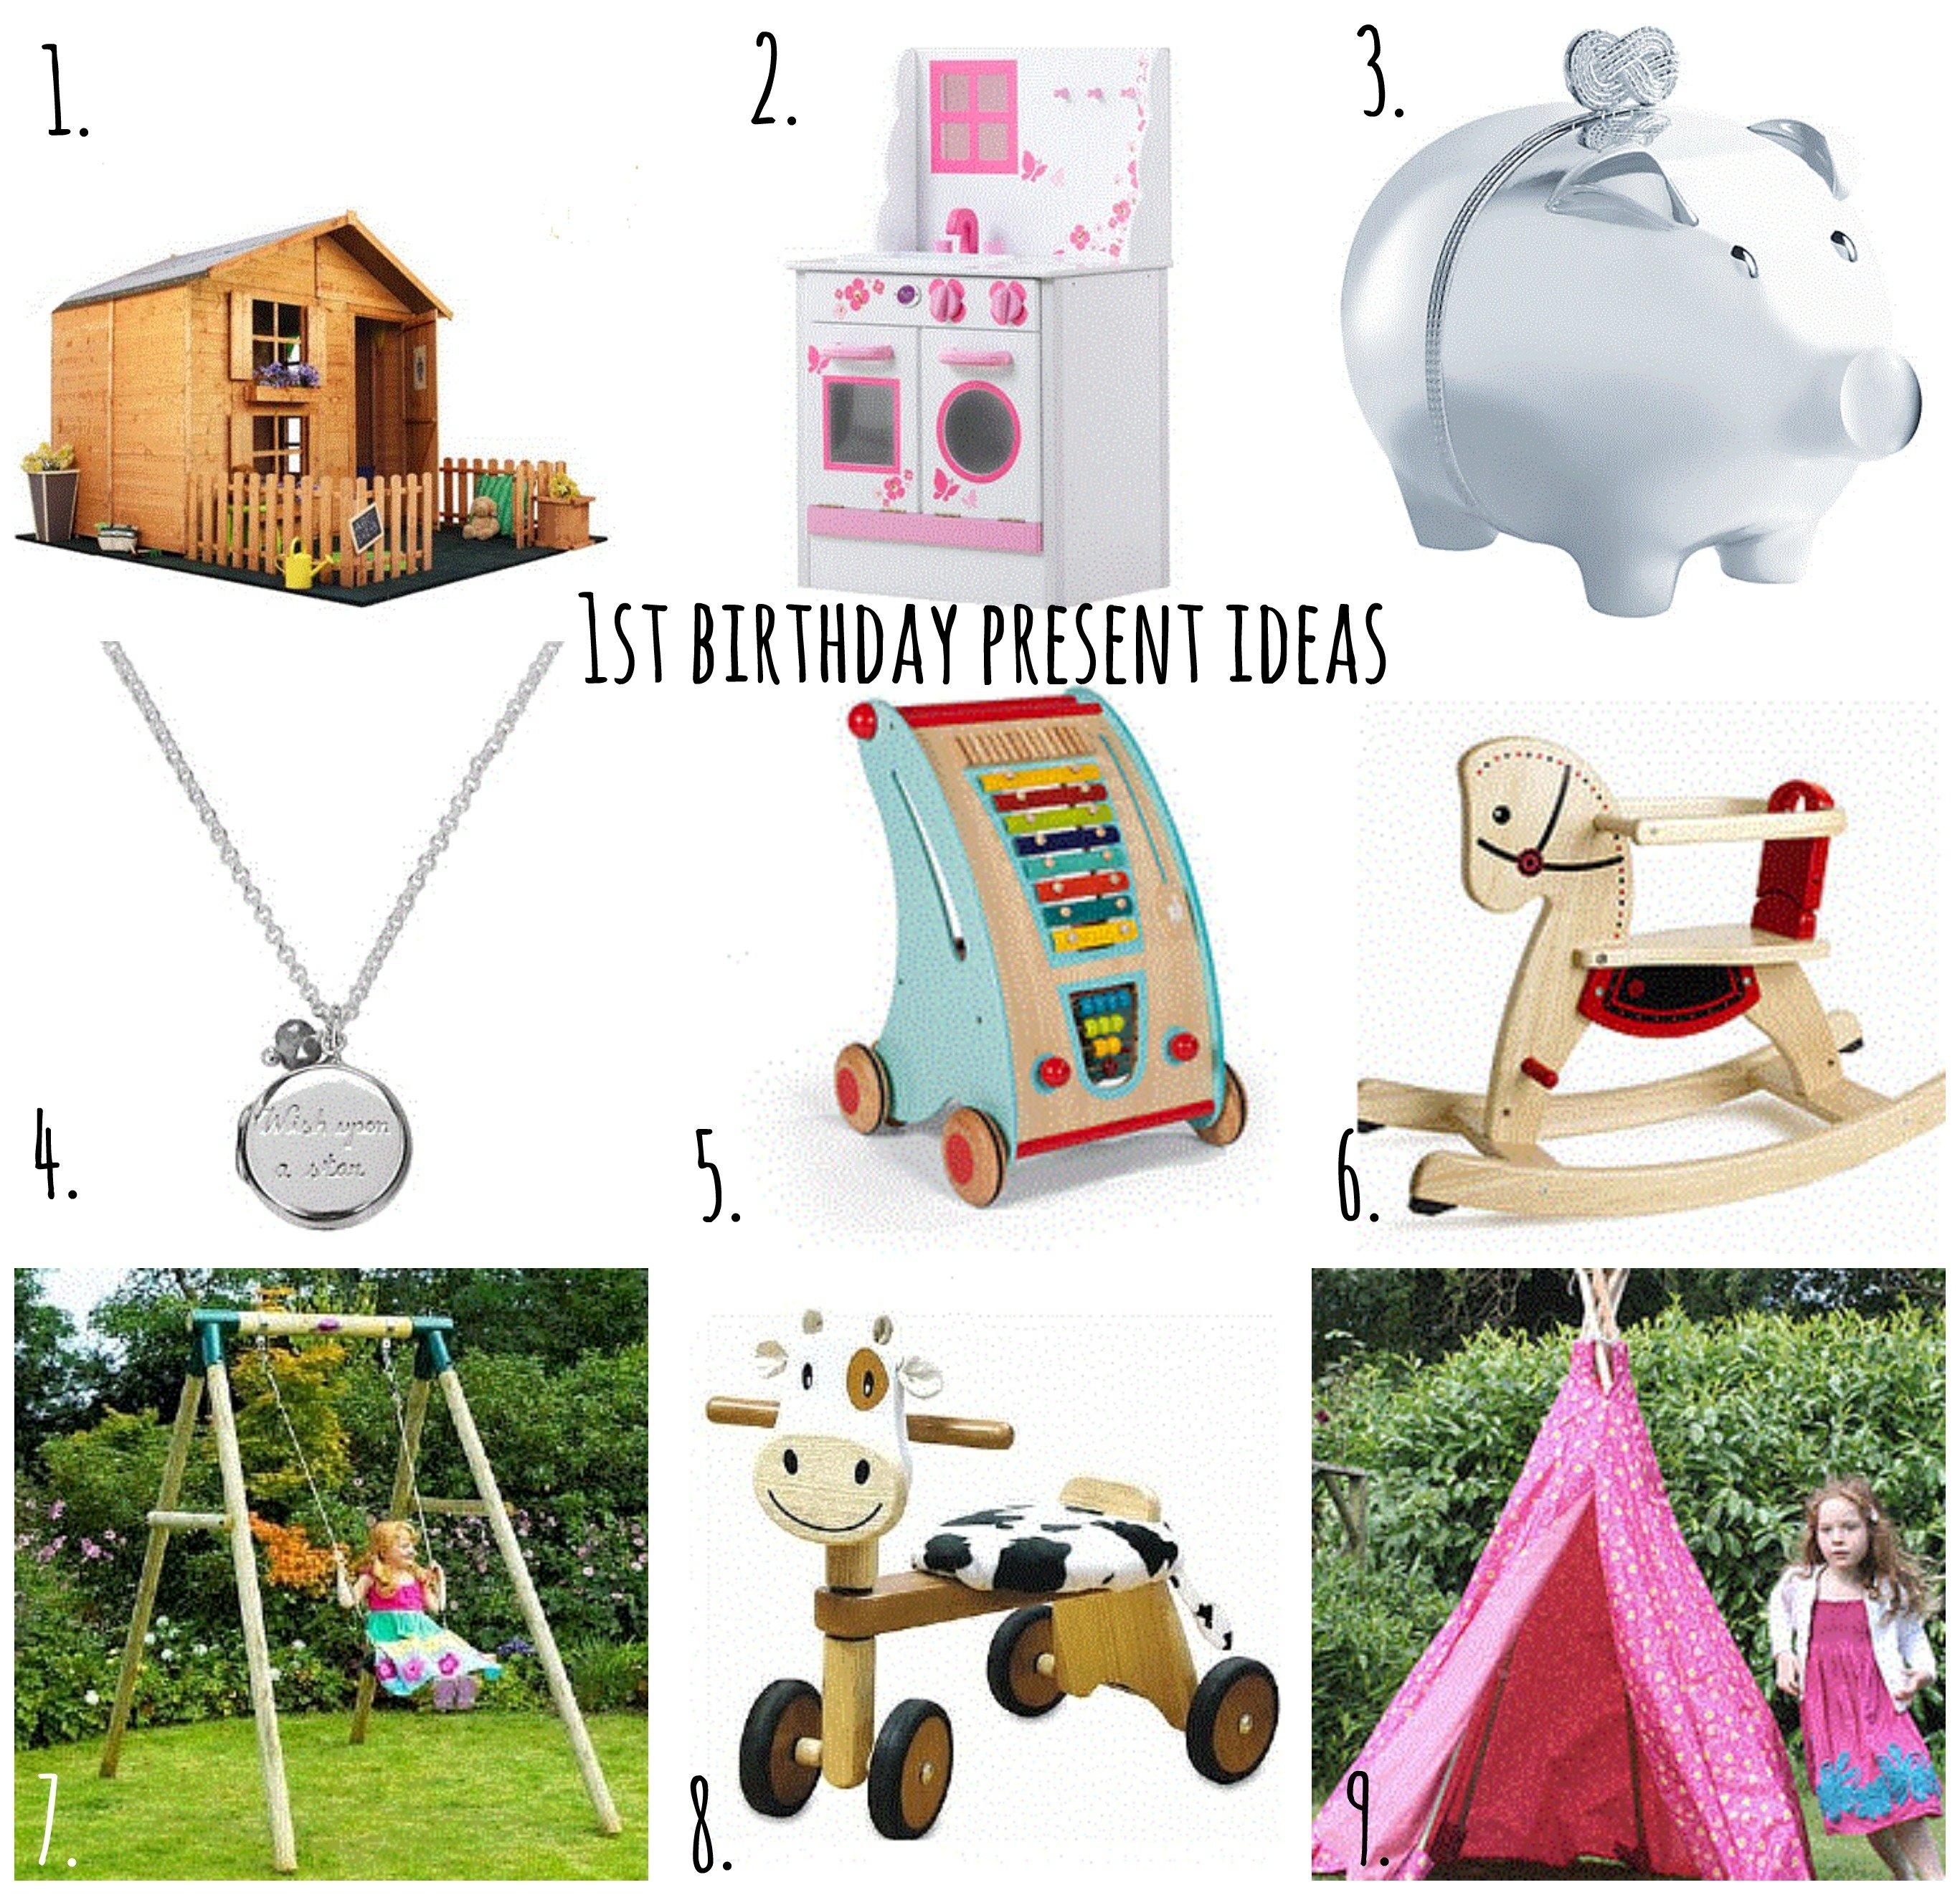 10 Wonderful Gift Ideas For 1St Birthday do you need 1st birthday present ideas 1 2020